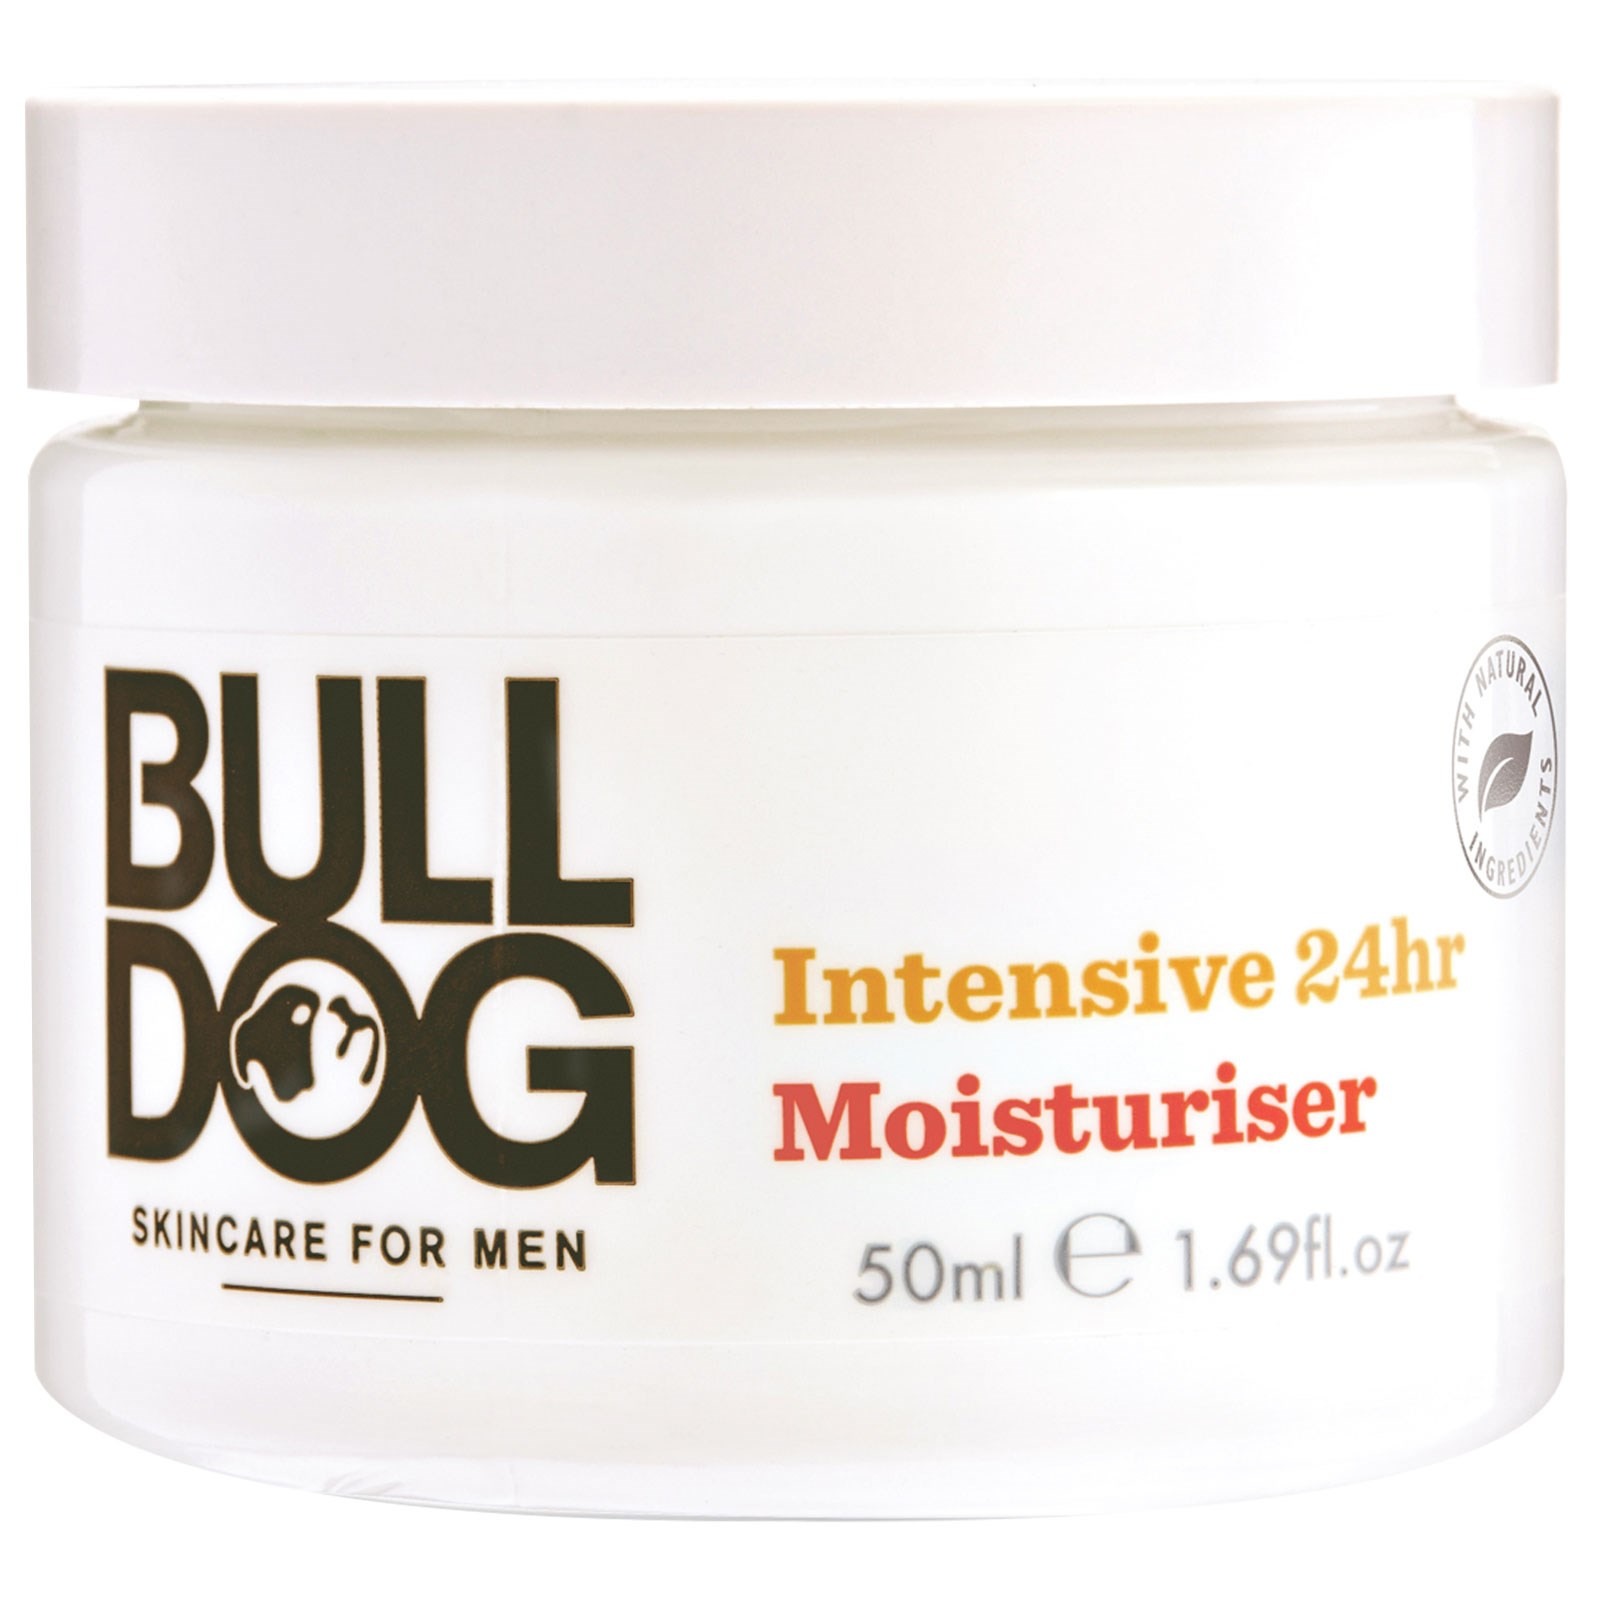 Bulldog Skincare For Men, Интенсивный Увлажнитель на 24 часа, 1,69 жидк.унций (50 мл)